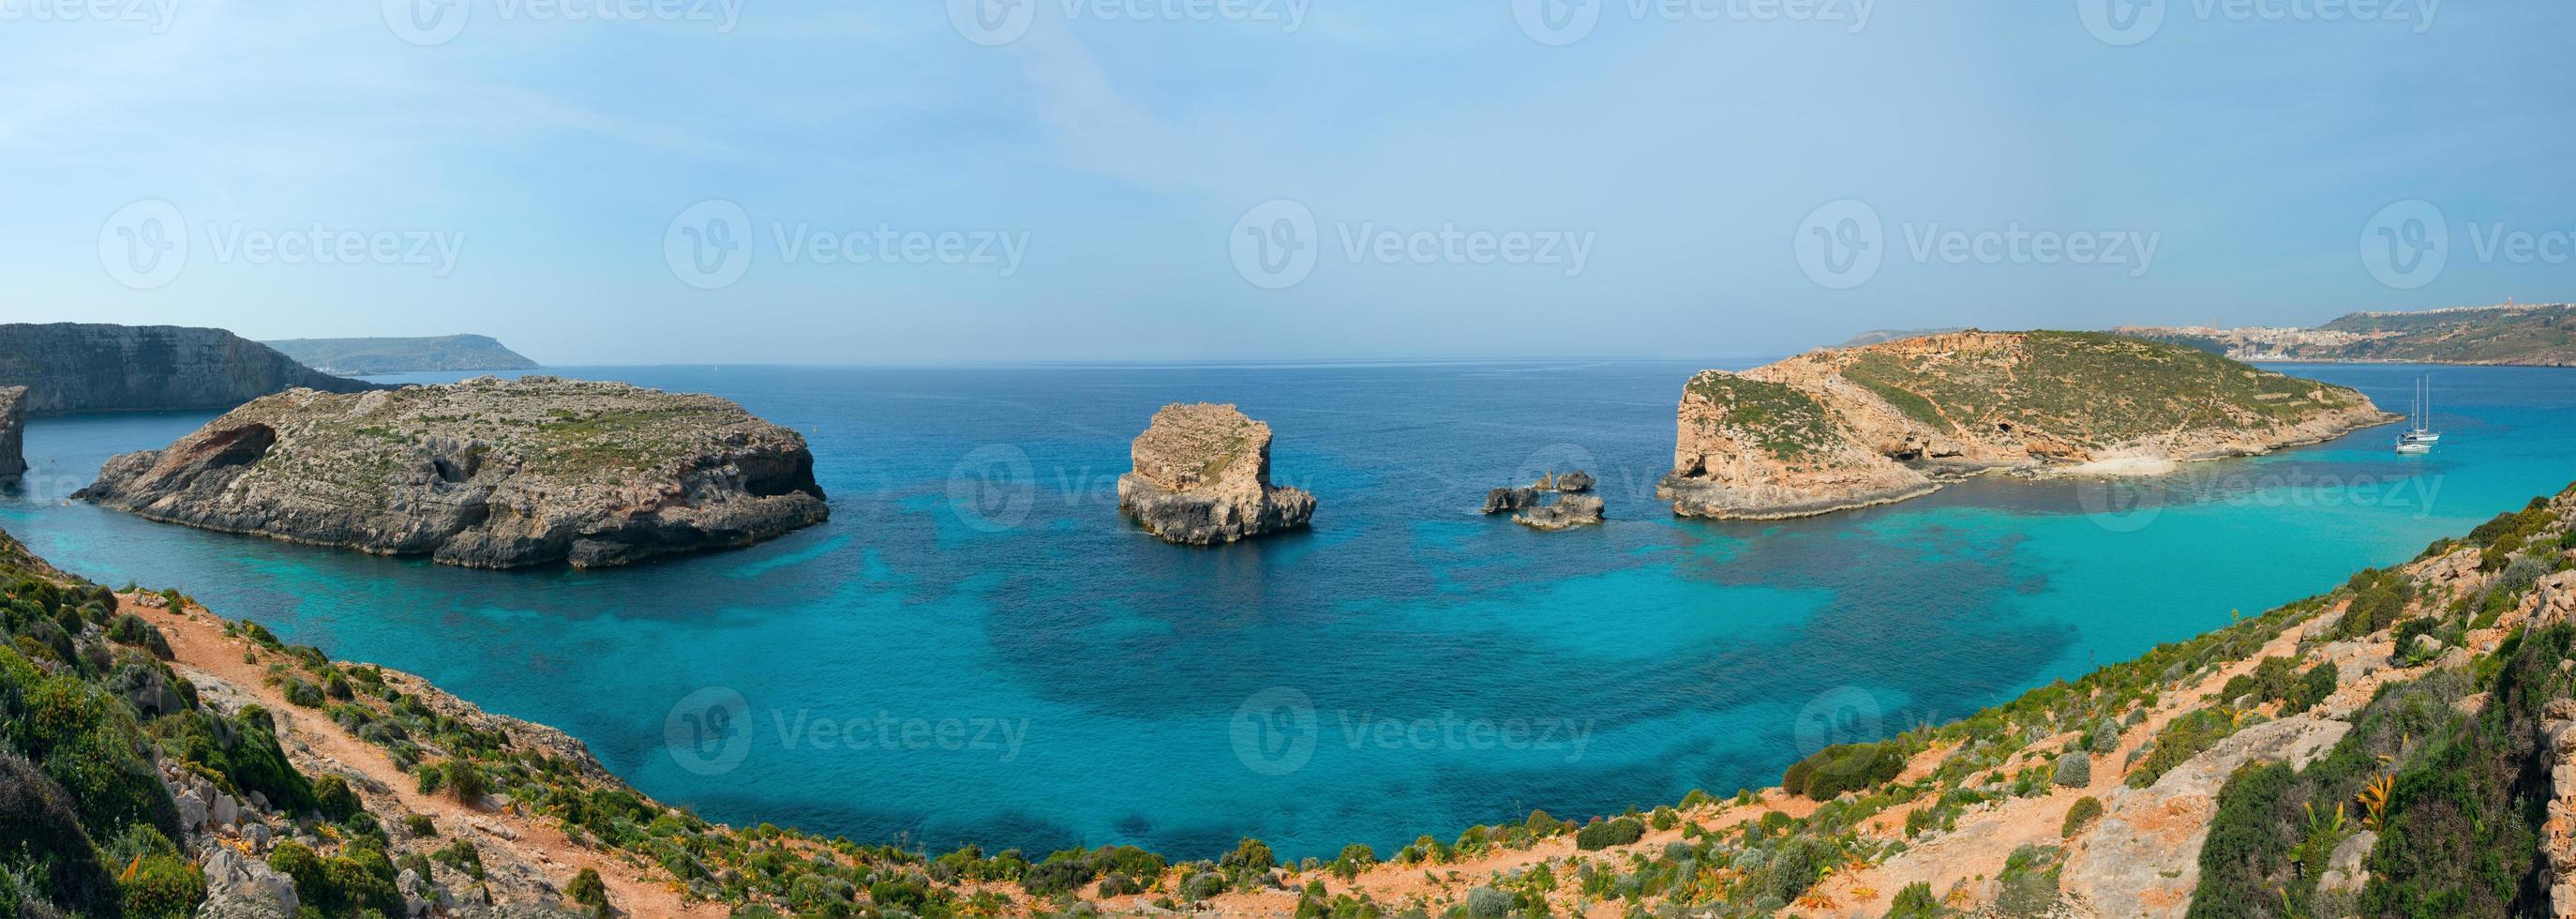 blå lagun comino ö malta gozo foto